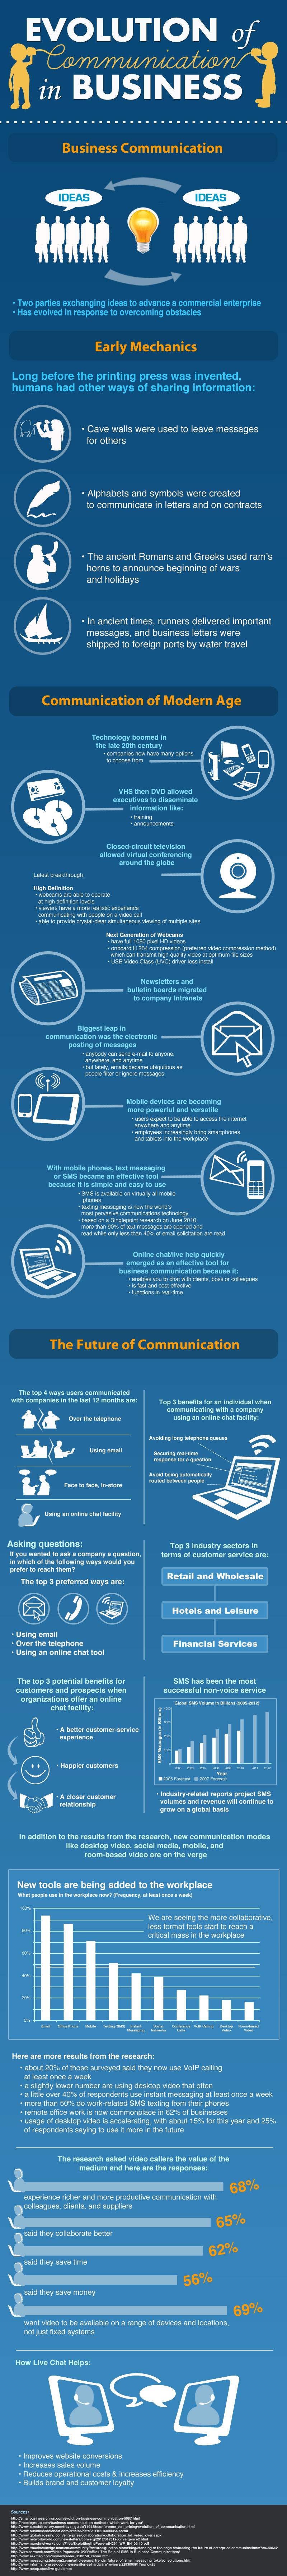 evolución de la comunicación